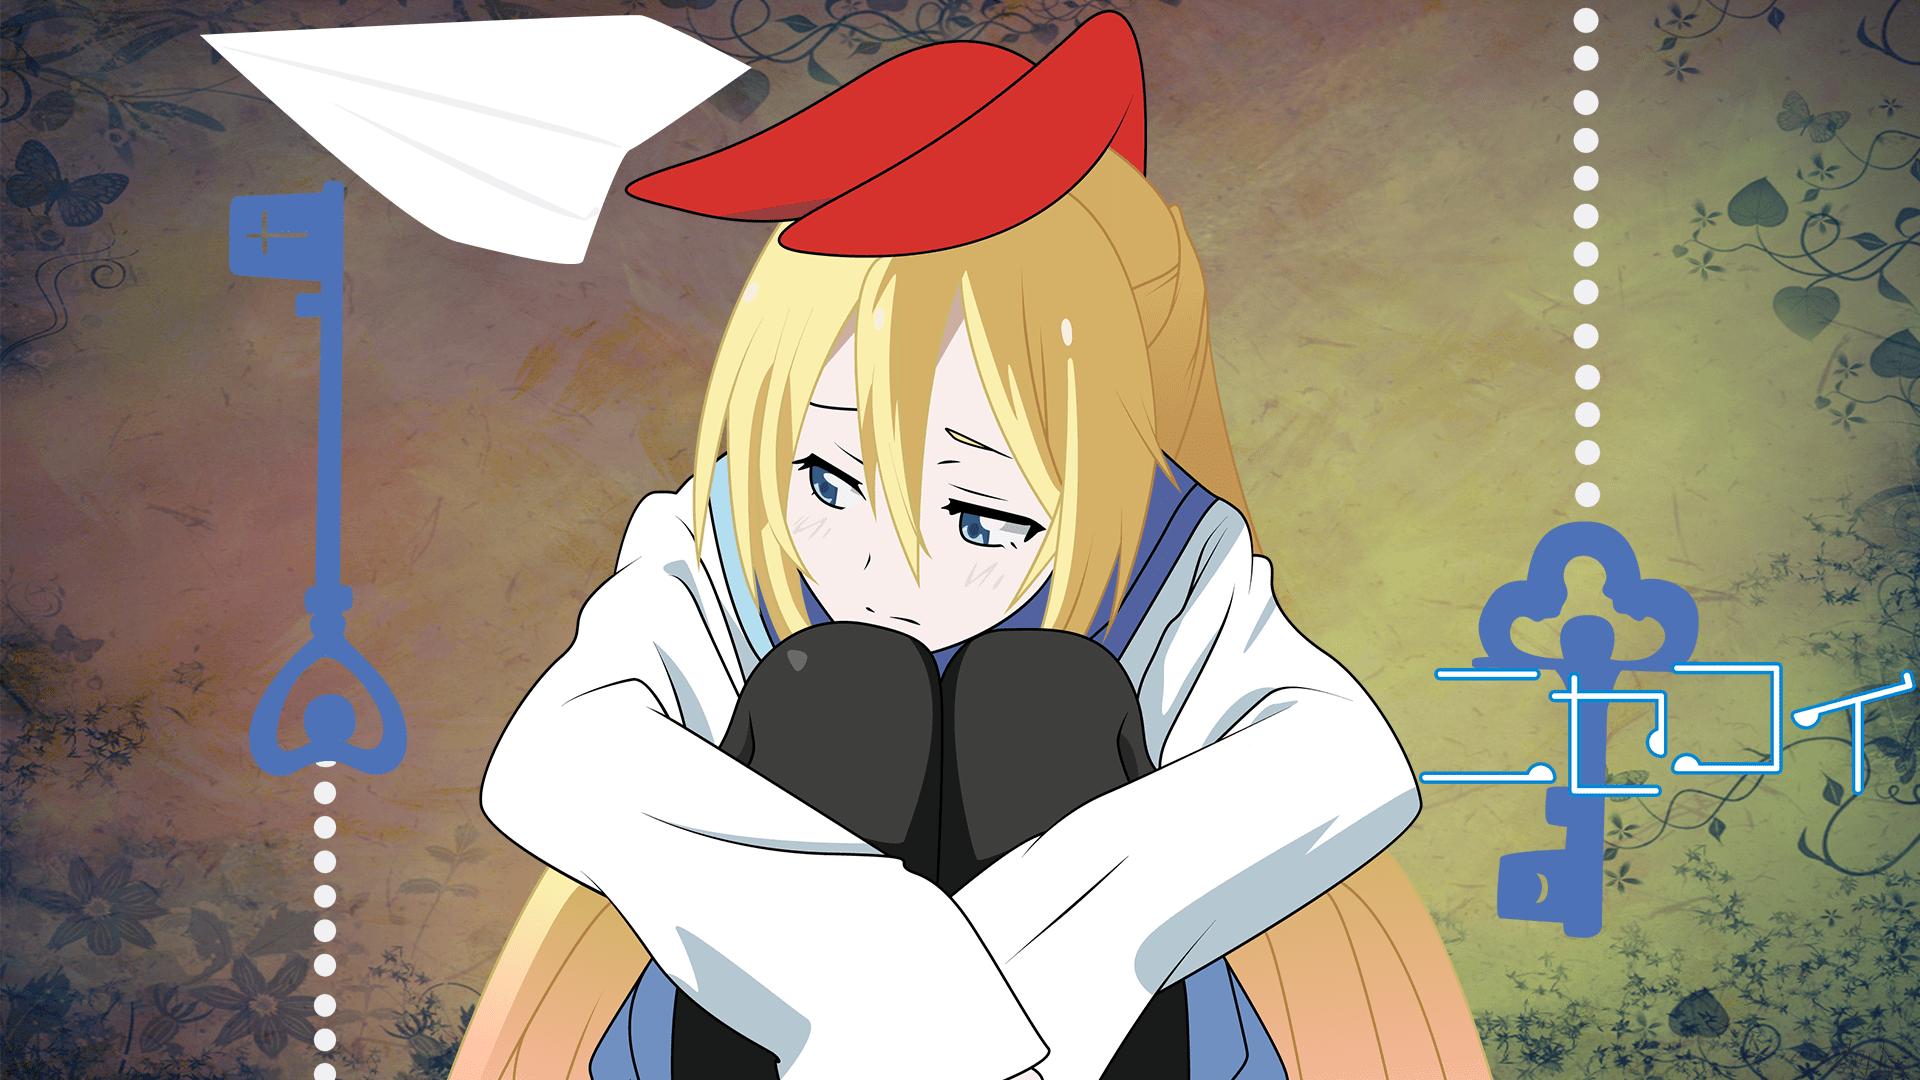 Sad Girl Crying Wallpaper Download Chitoge Kirisaki Hd Wallpaper Background Image